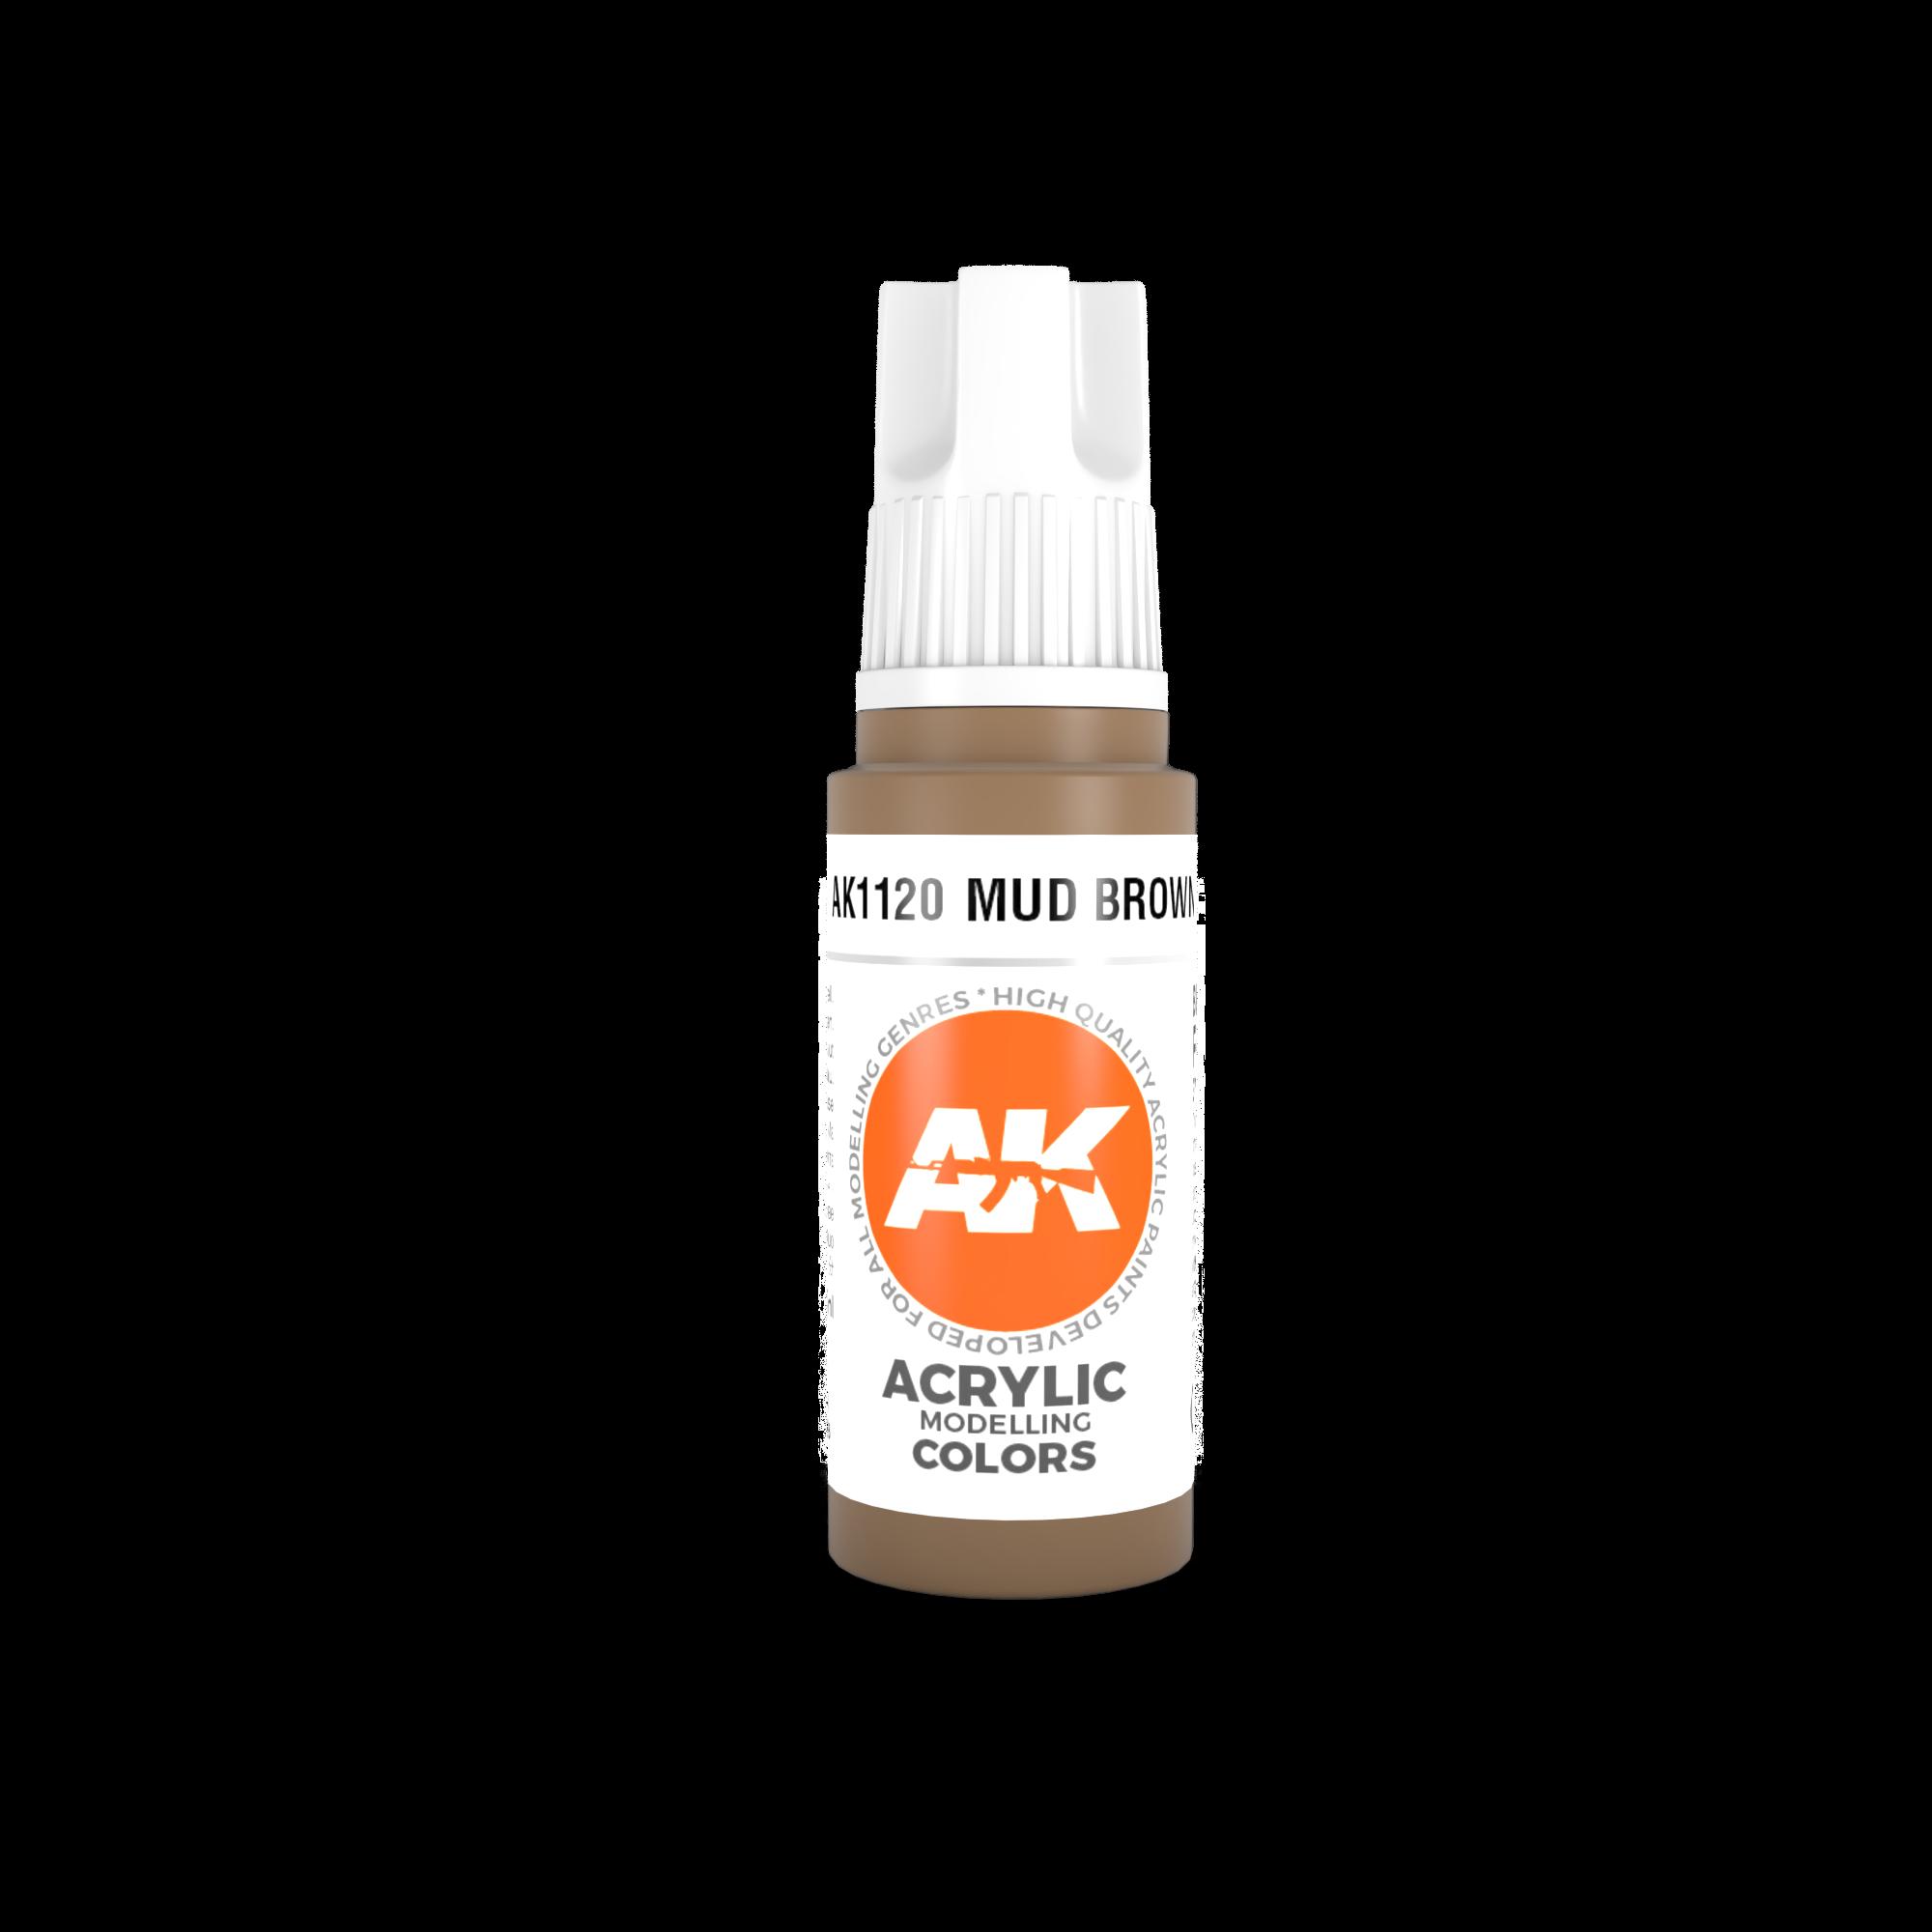 AK-Interactive Mud Brown Acrylic Modelling Color - 17ml - AK-11120